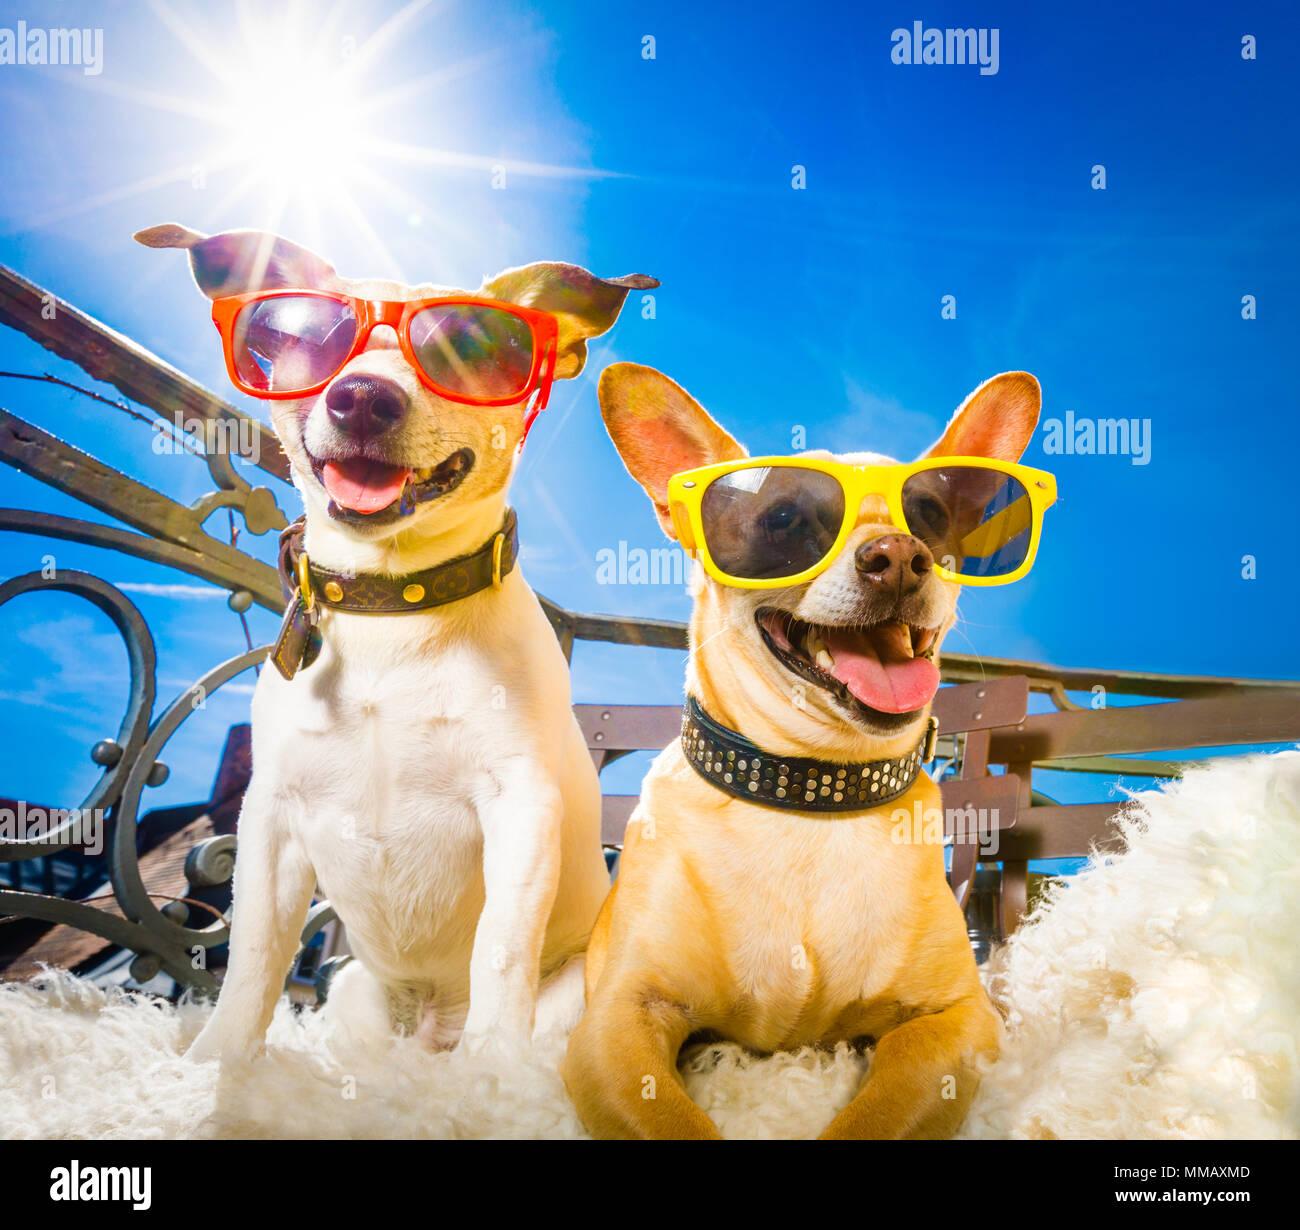 Couple Enjoying Their Summer Holidays Stock Photo: Couple Of Dogs With Sunglasses At Balcony Enjoying The Sun